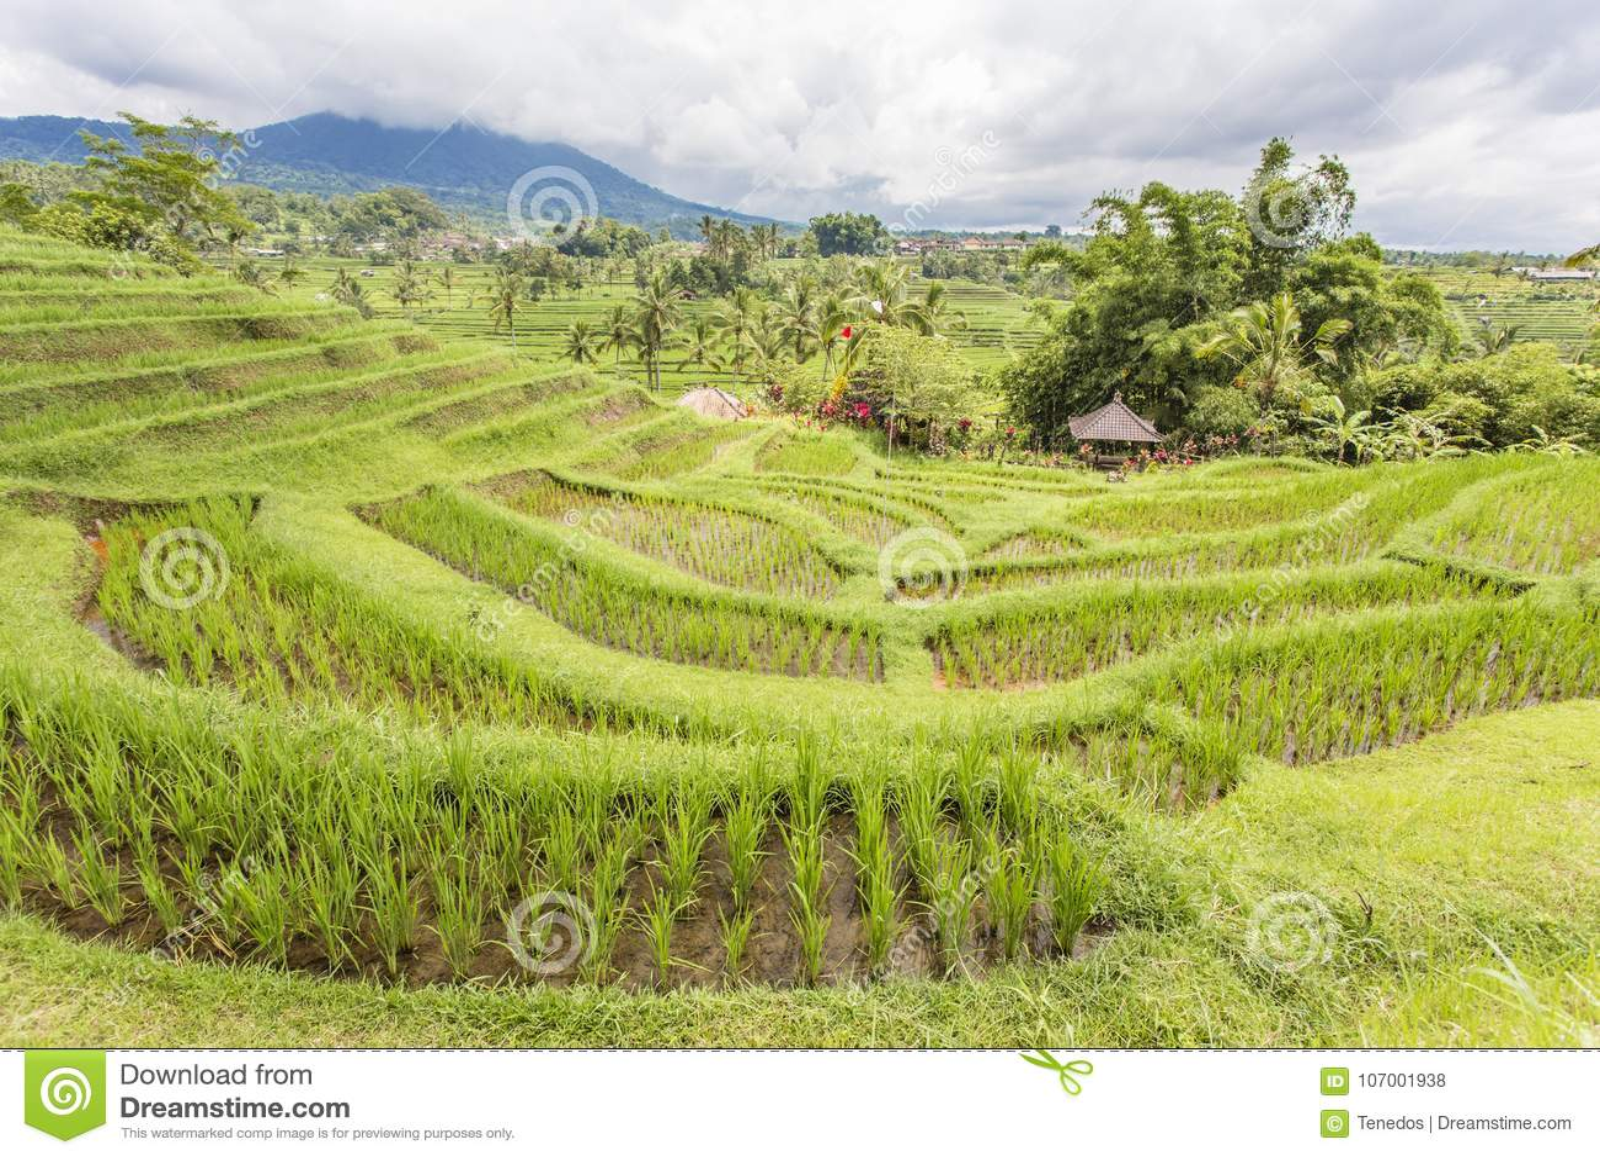 Jatiluwih Rice Terrace Stock Photo Image Of Background 107001938